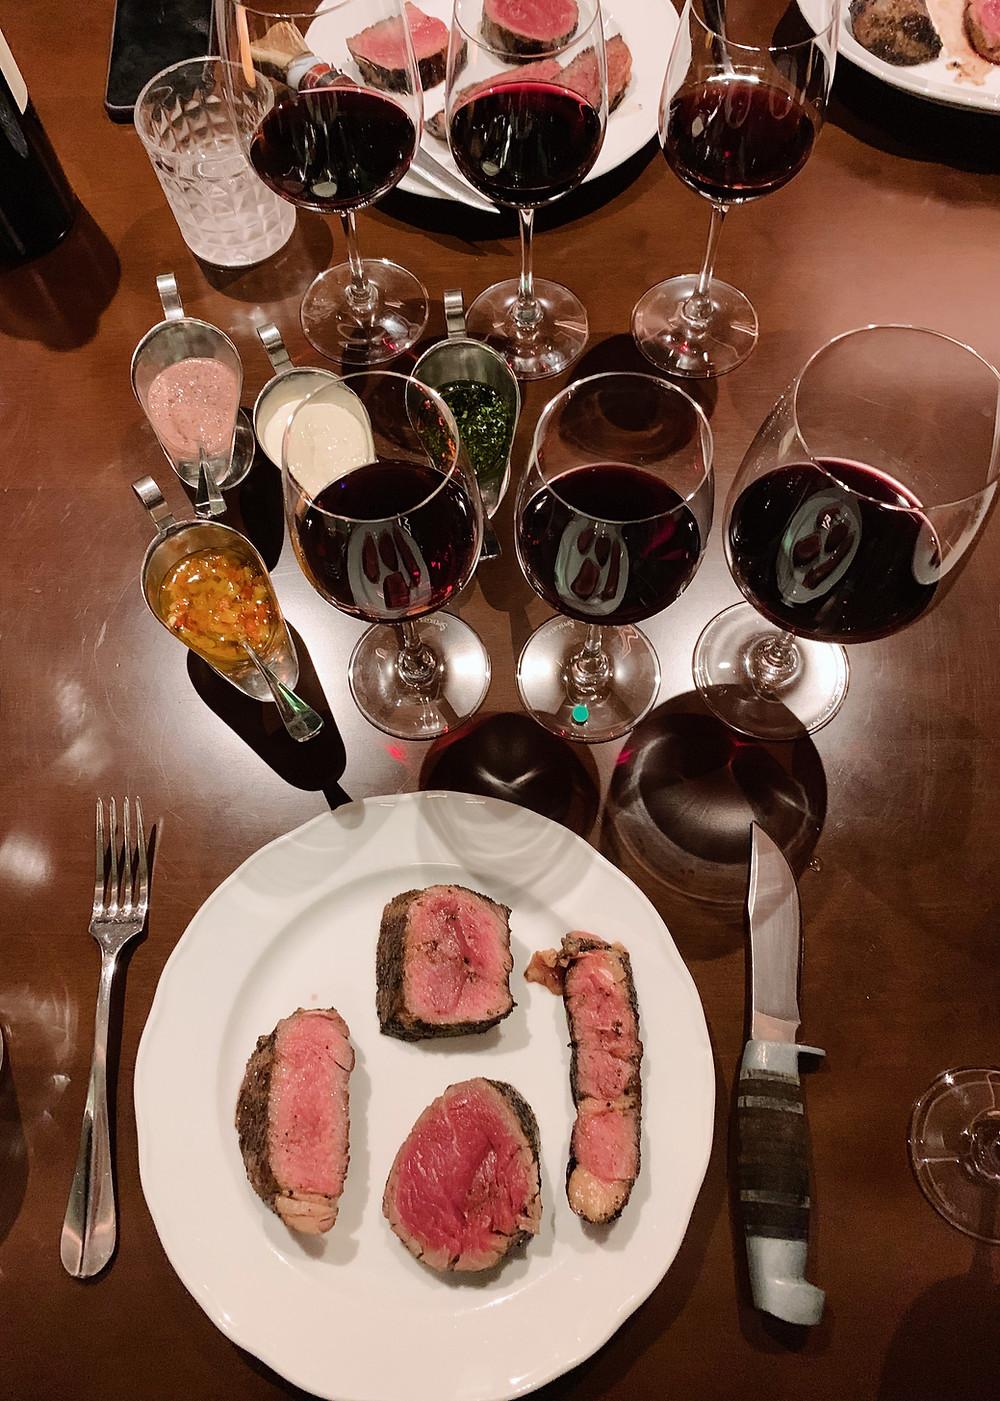 Steak at Buenos Aires Polo Club in Hong Kong